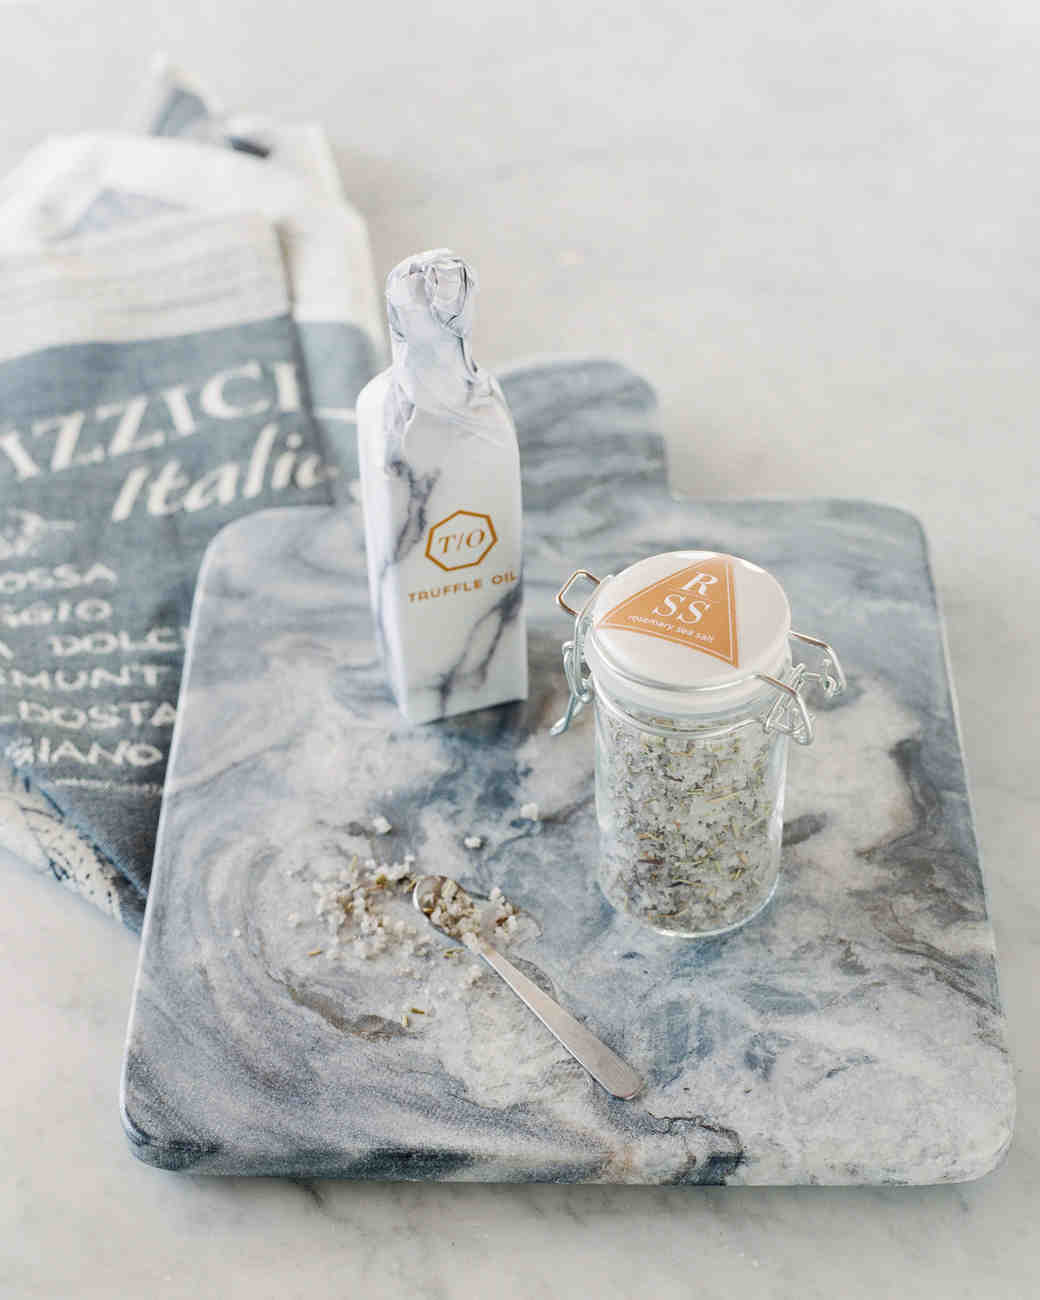 dennis-bryan-wedding-italy-salt-oil-favors-006-0070-s112633_vert.jpg